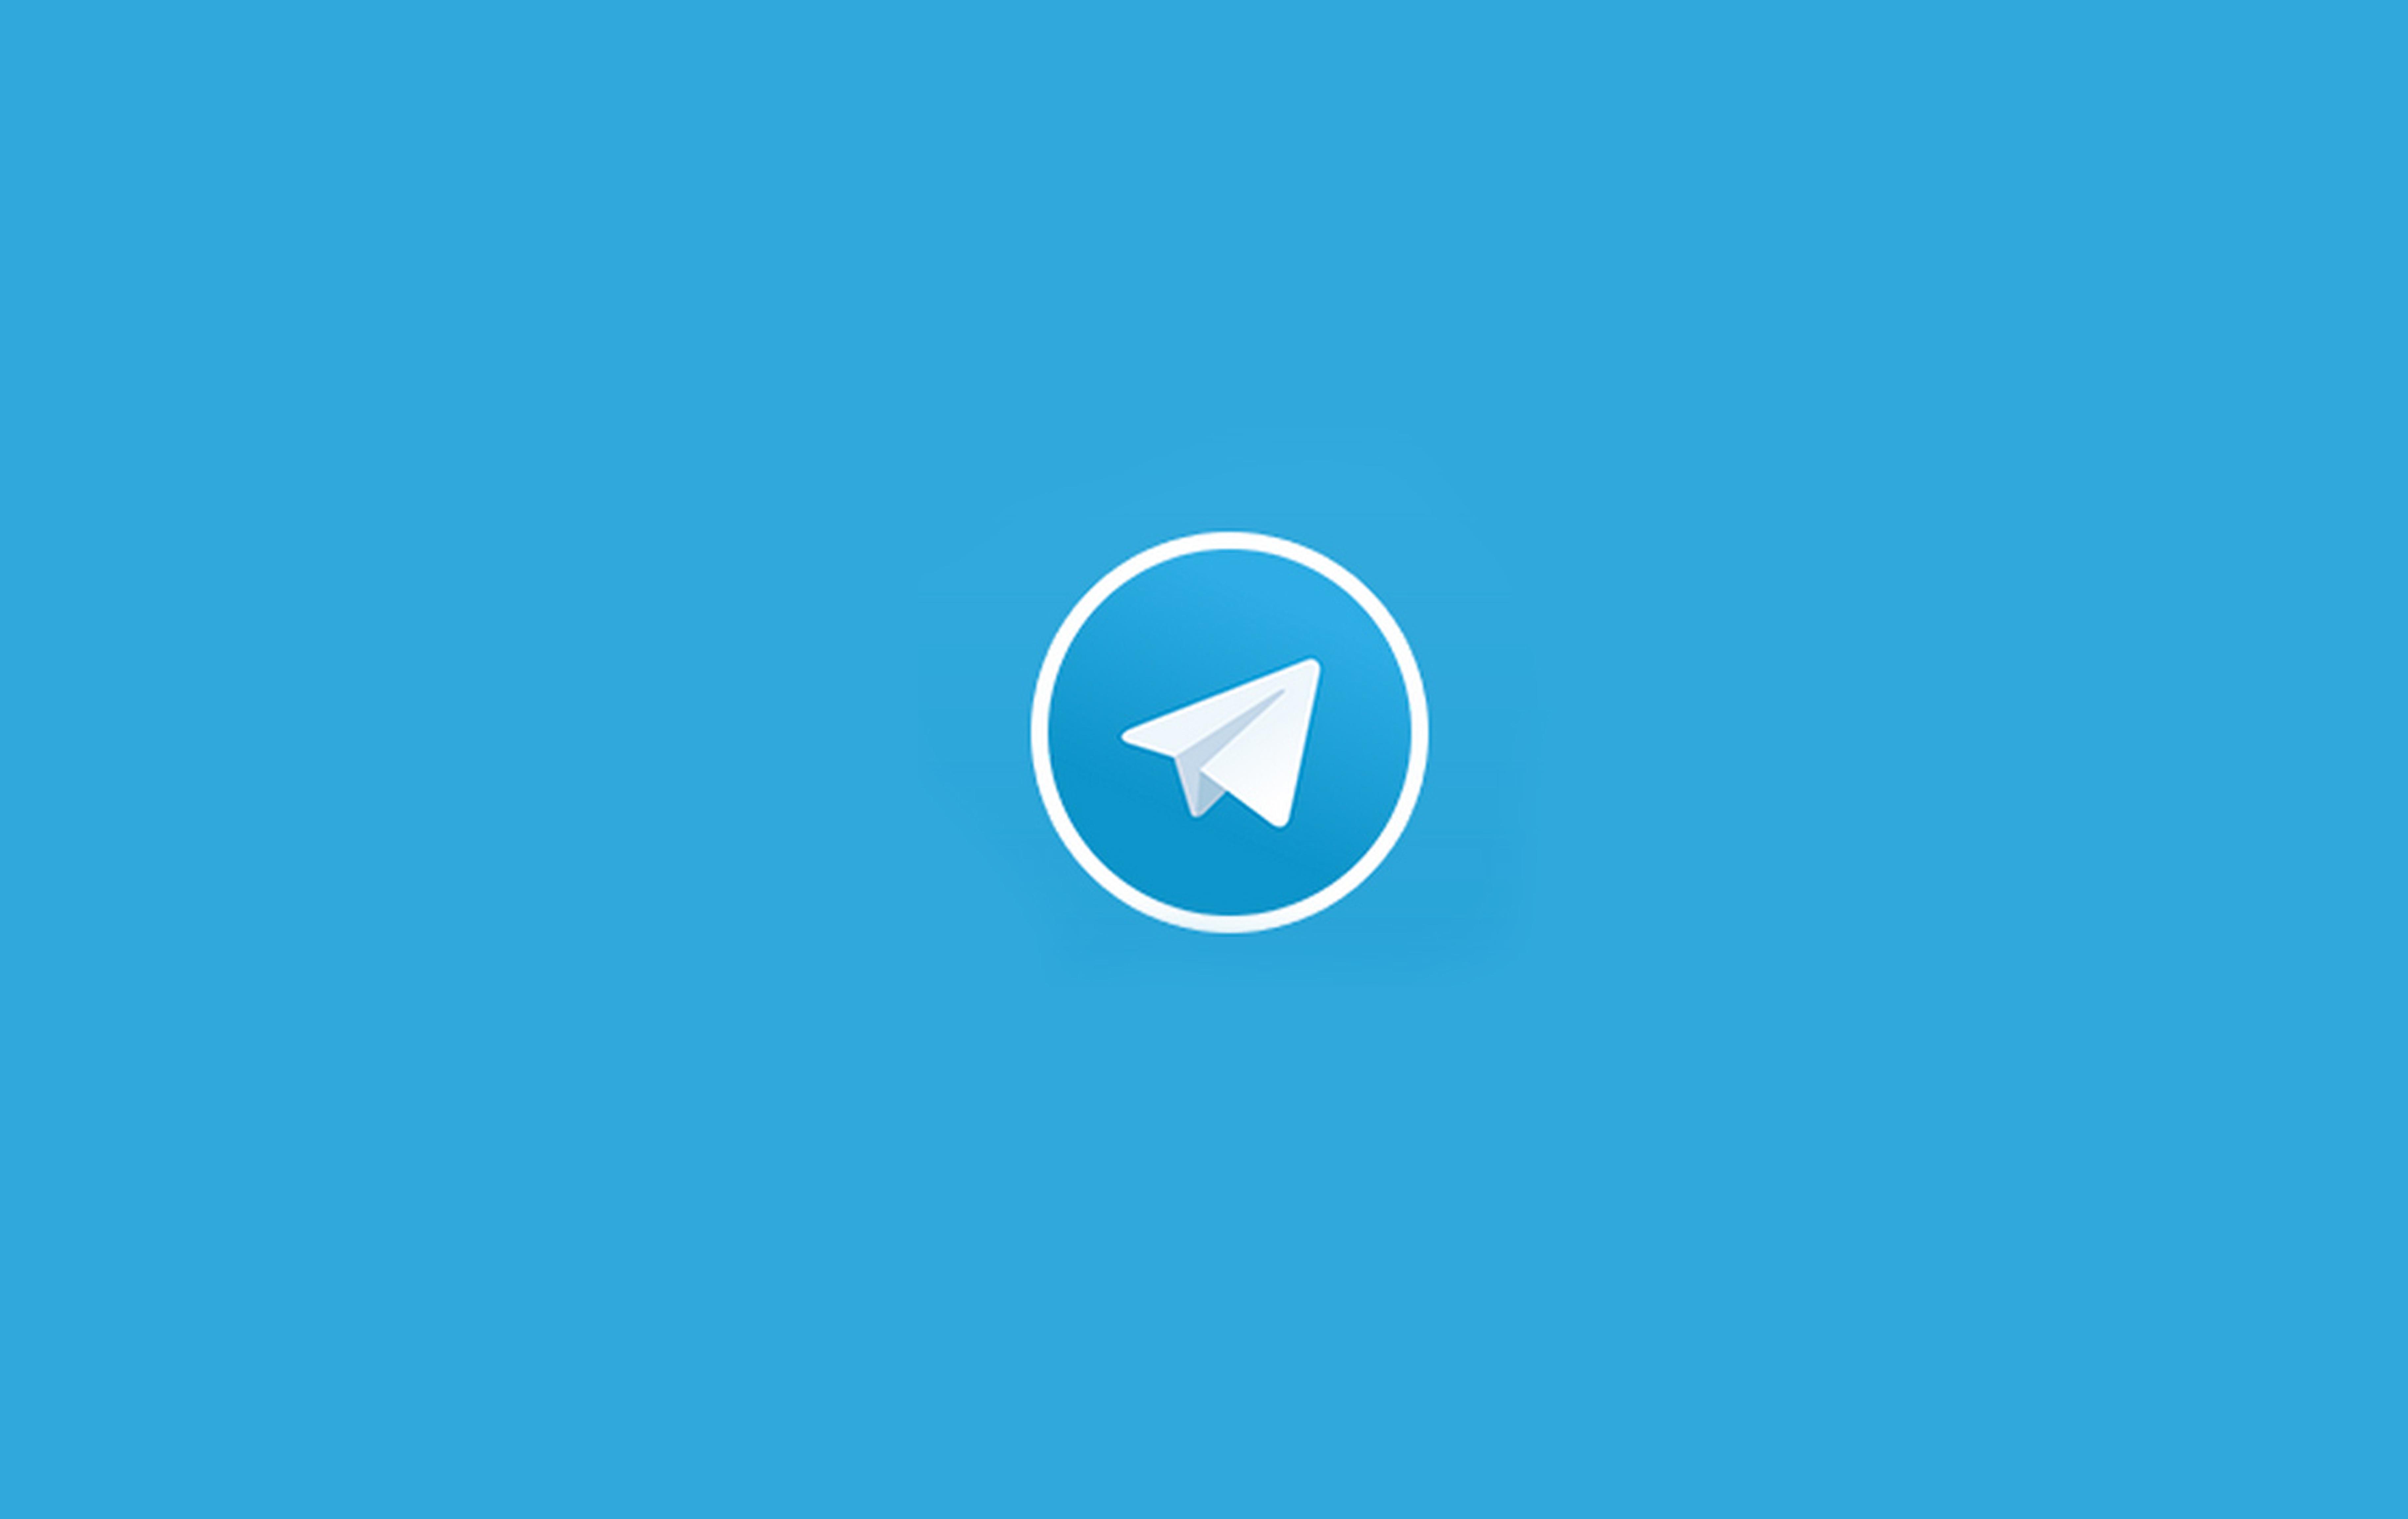 گروه تلگرام خورموجی ها Блог / Публикации it-technology / Блоги о промышленности на Complexdoc